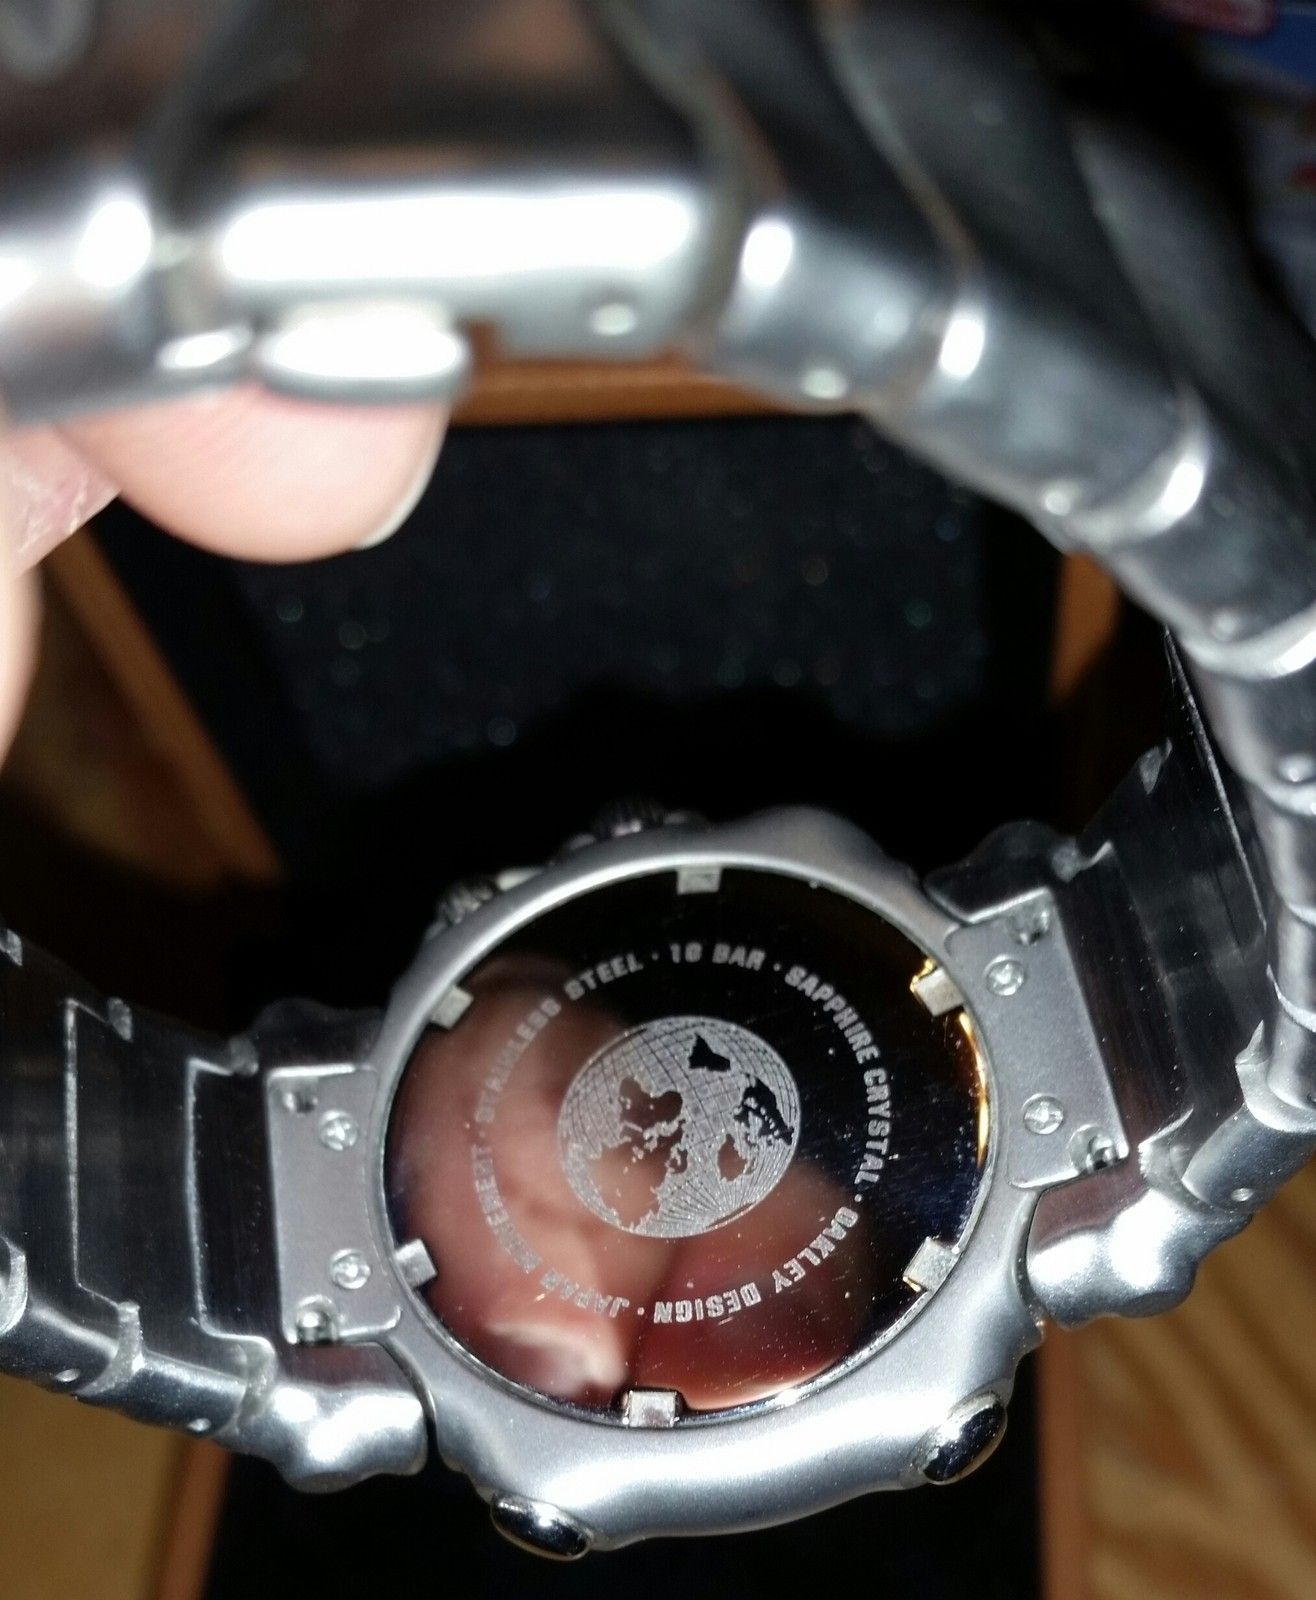 GMT Silver with Blue Face - uploadfromtaptalk1416890246937.jpg